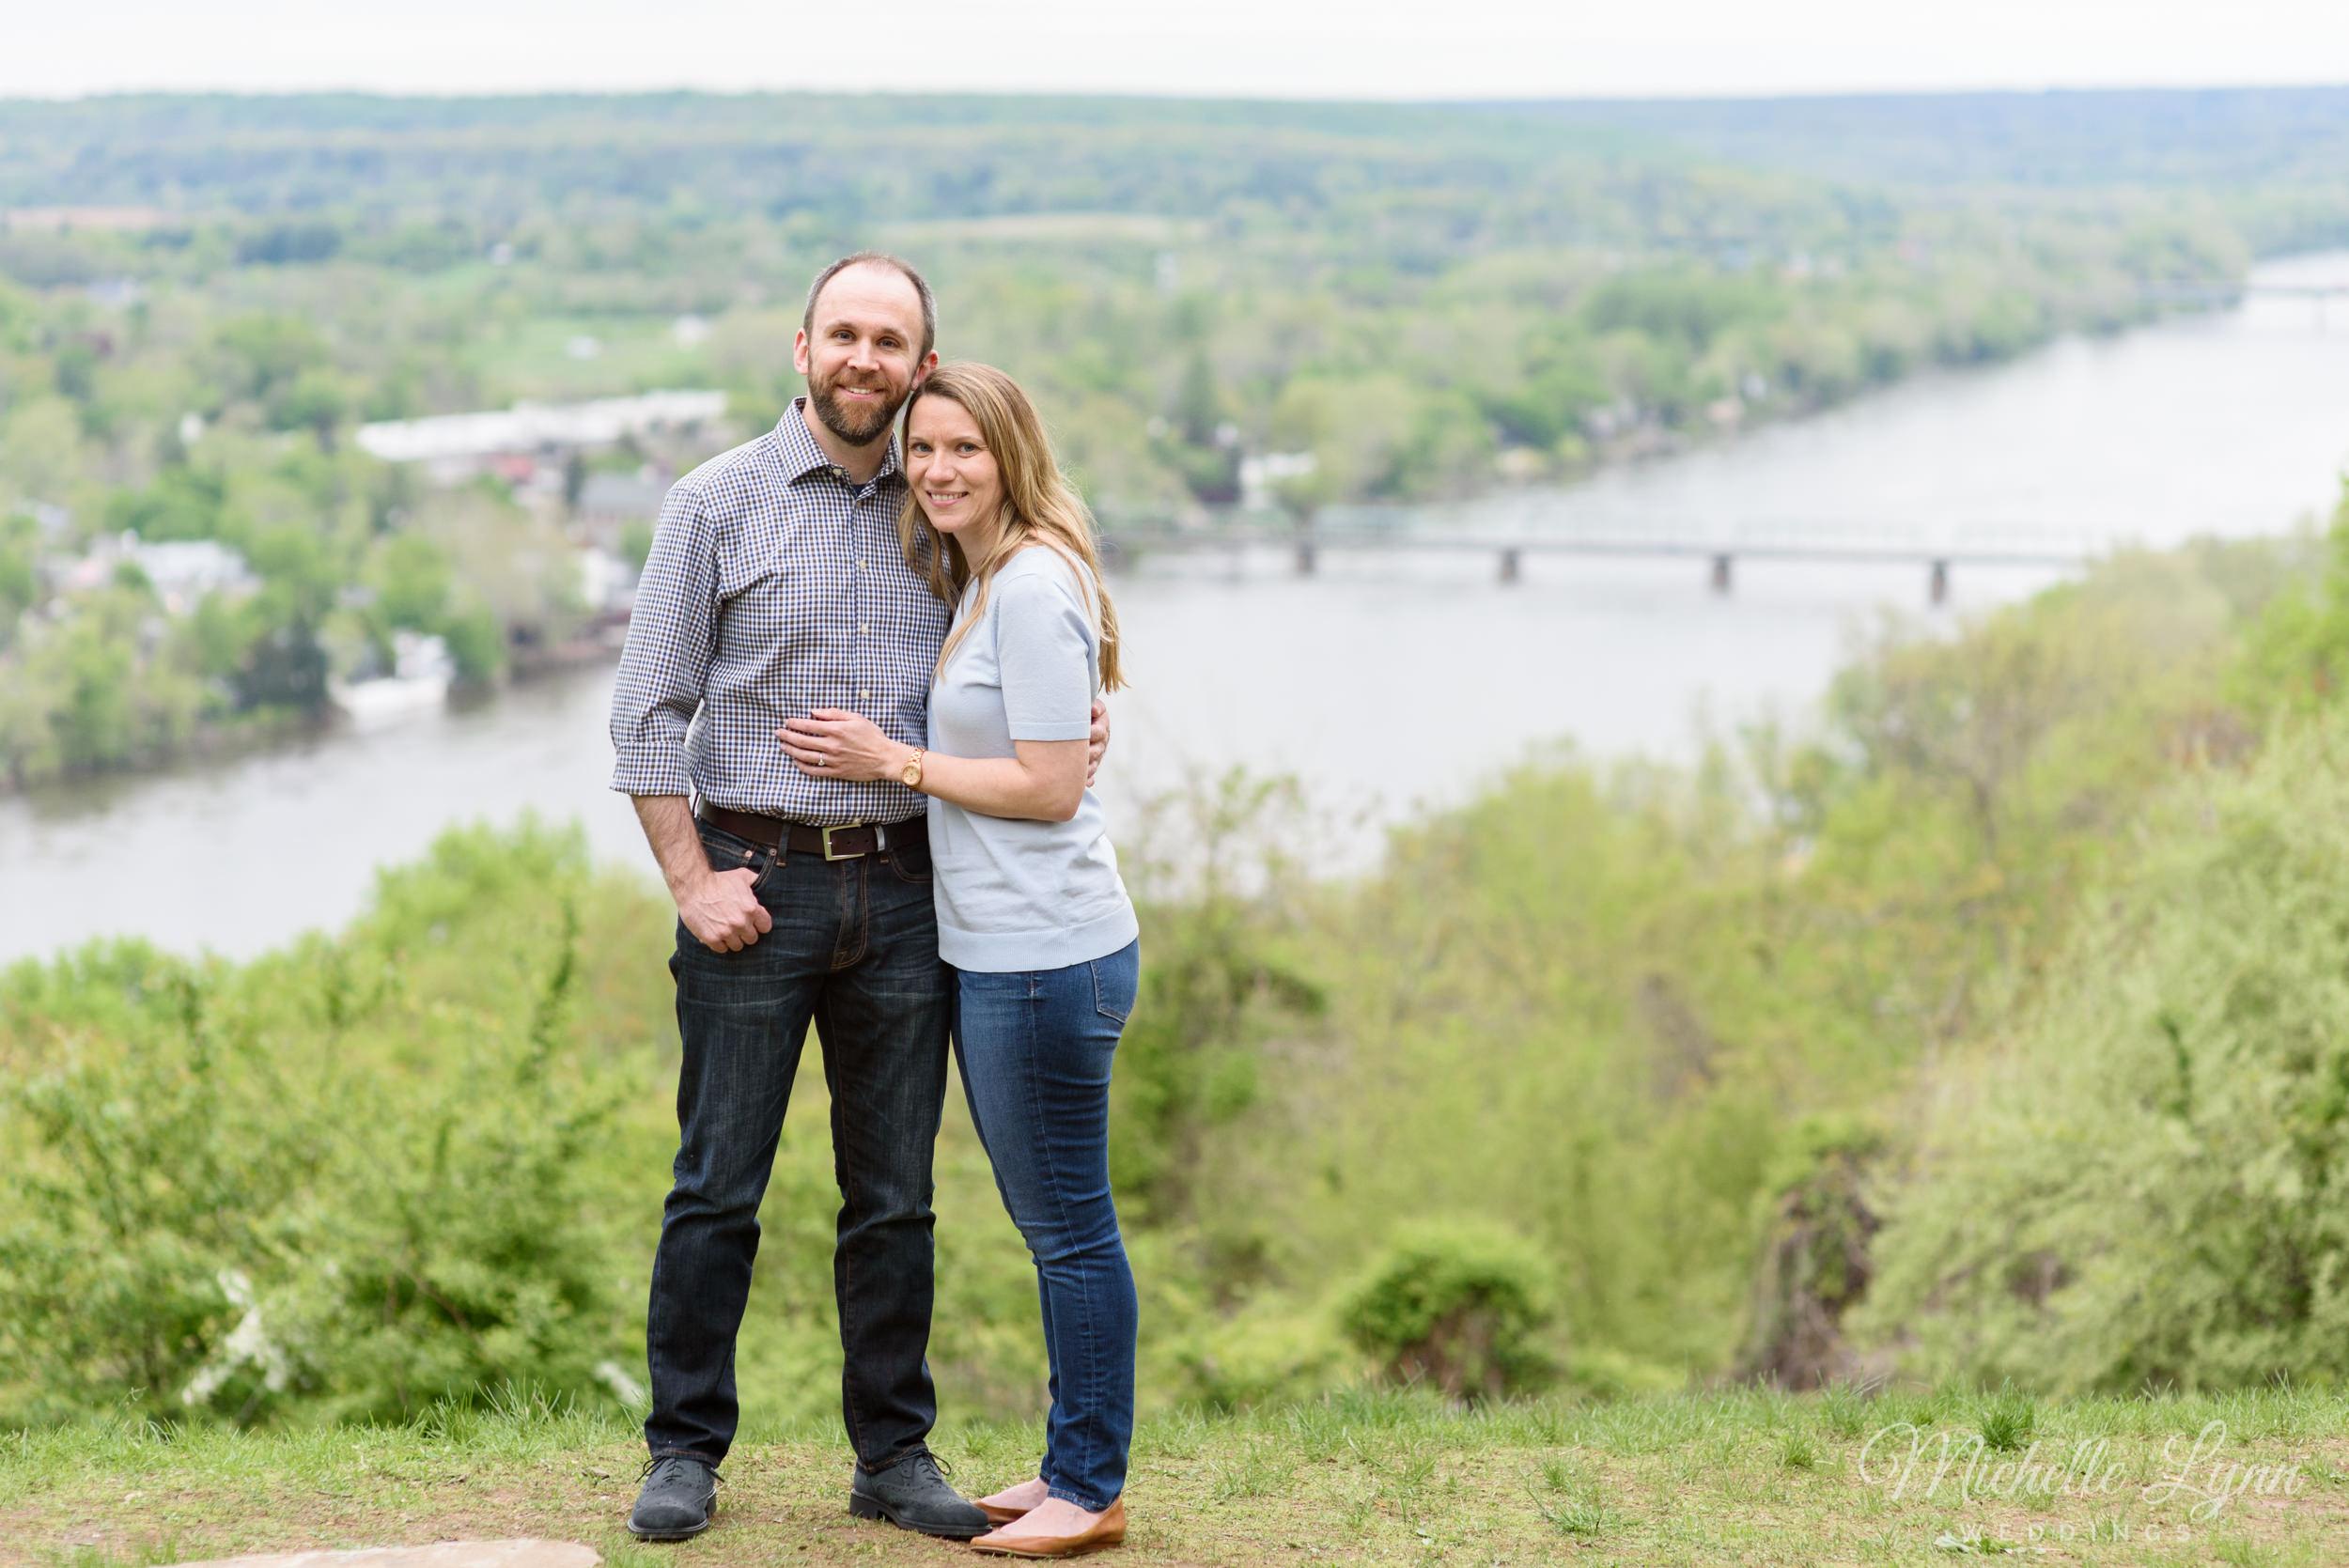 mlw-washingtons-crossing-pennsylvania-engagement-photos-30.jpg